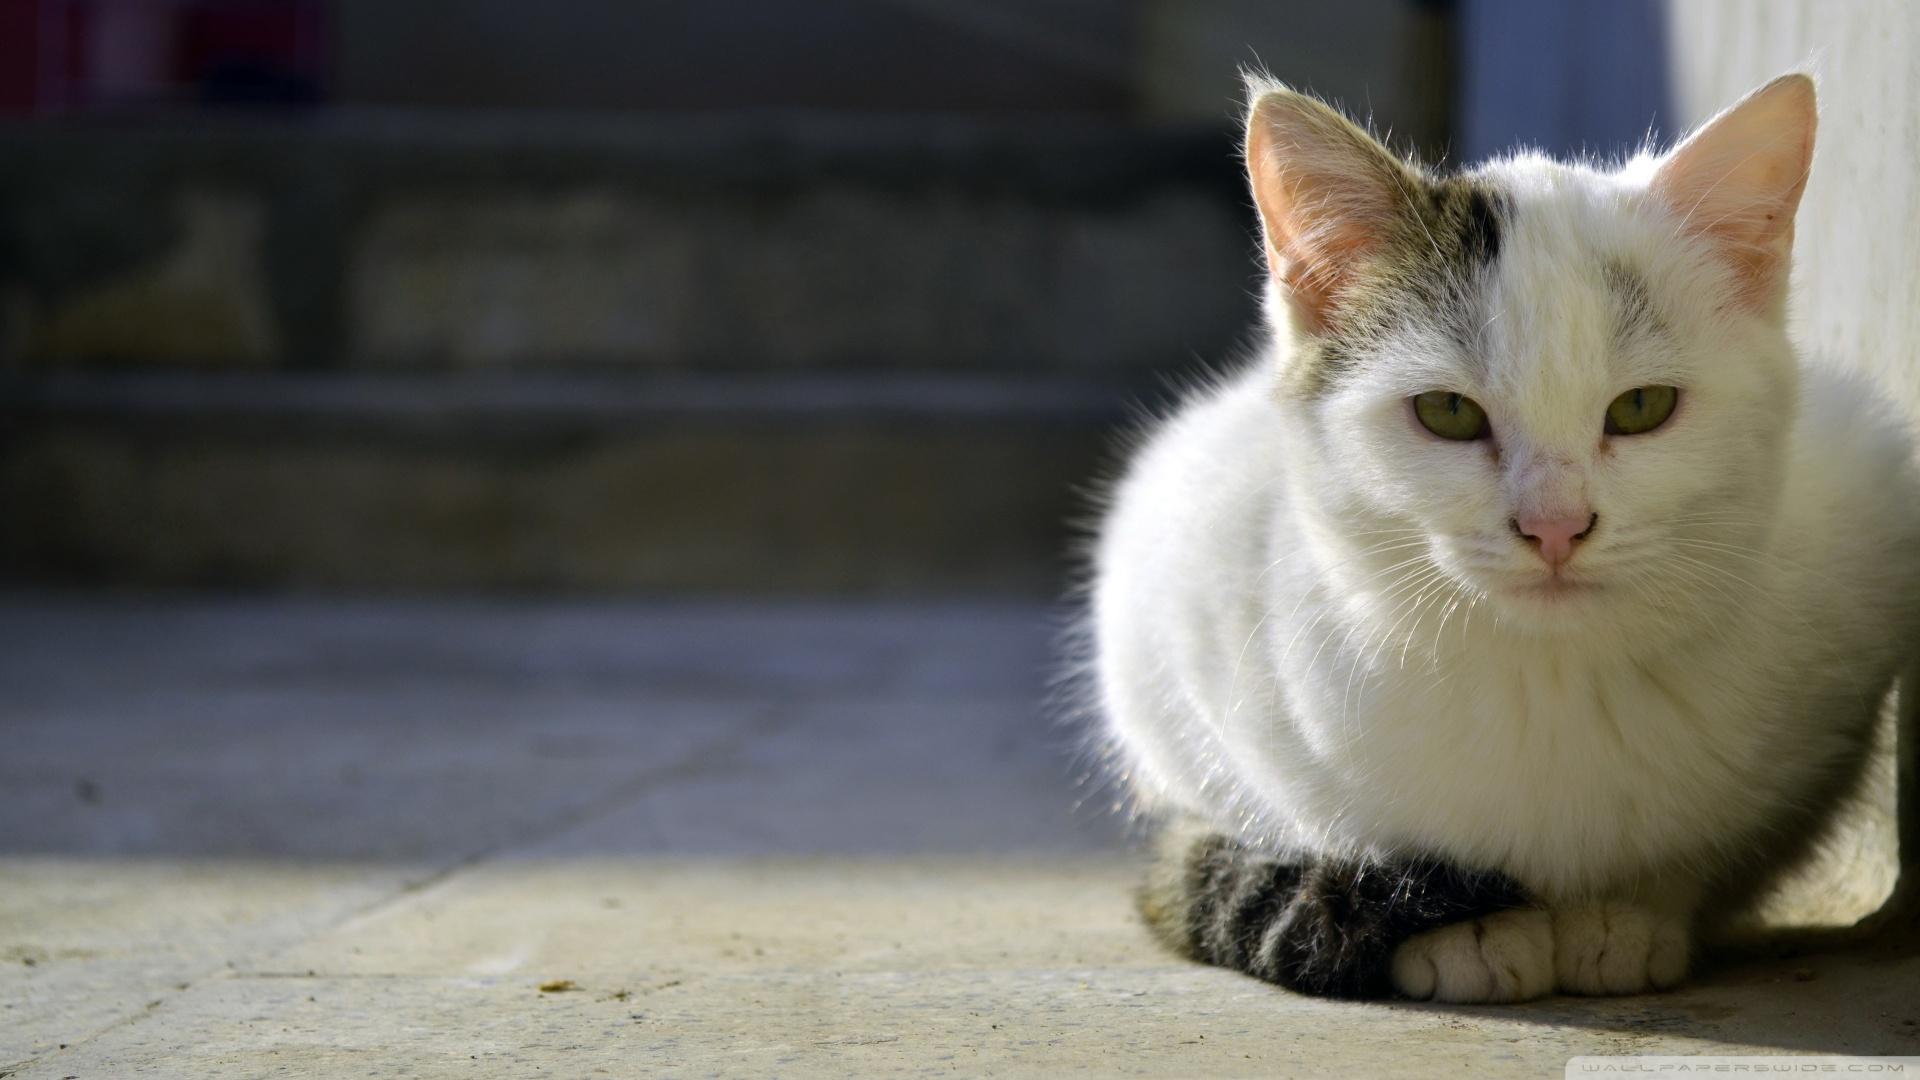 Cute Cat Hd Wallpapers For Mobile Persian Cat Ultra Hd Desktop Background Wallpaper For 4k